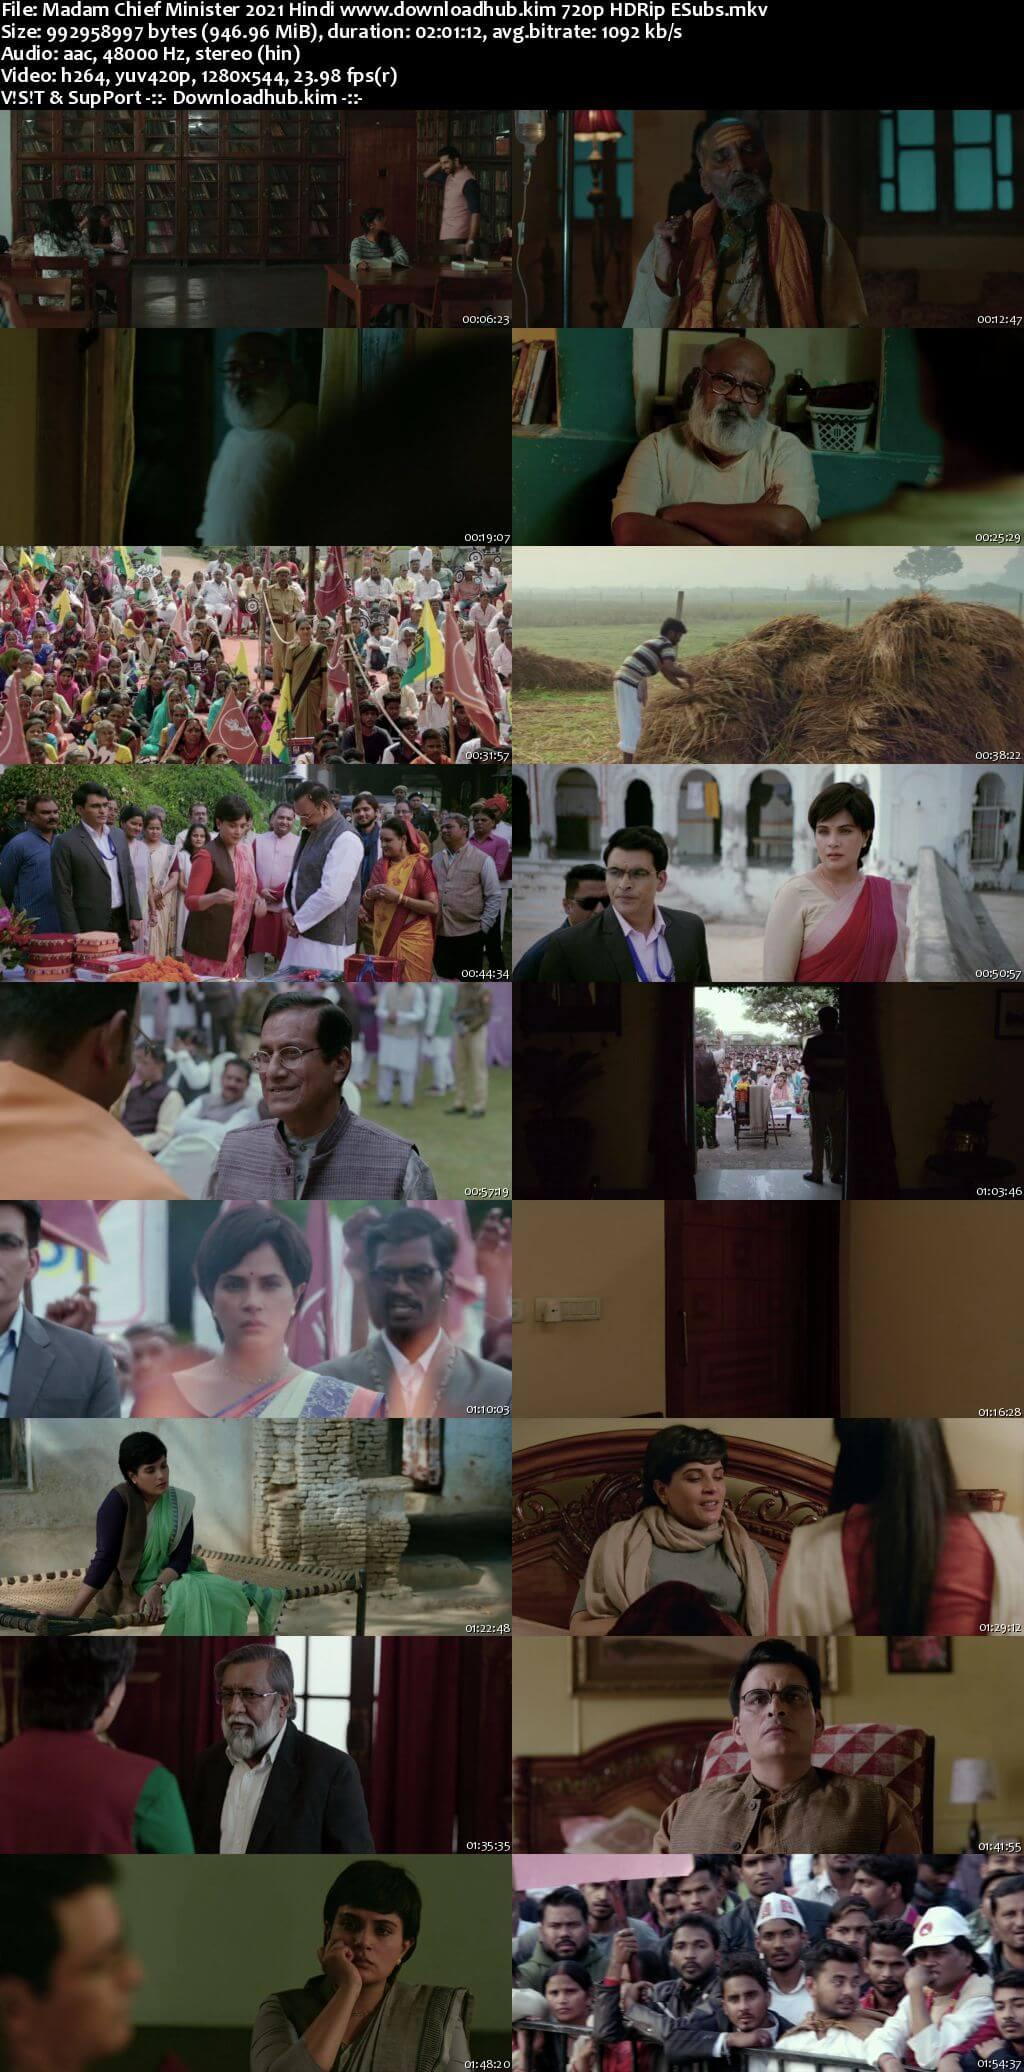 Madam Chief Minister 2021 Hindi 720p HDRip ESubs